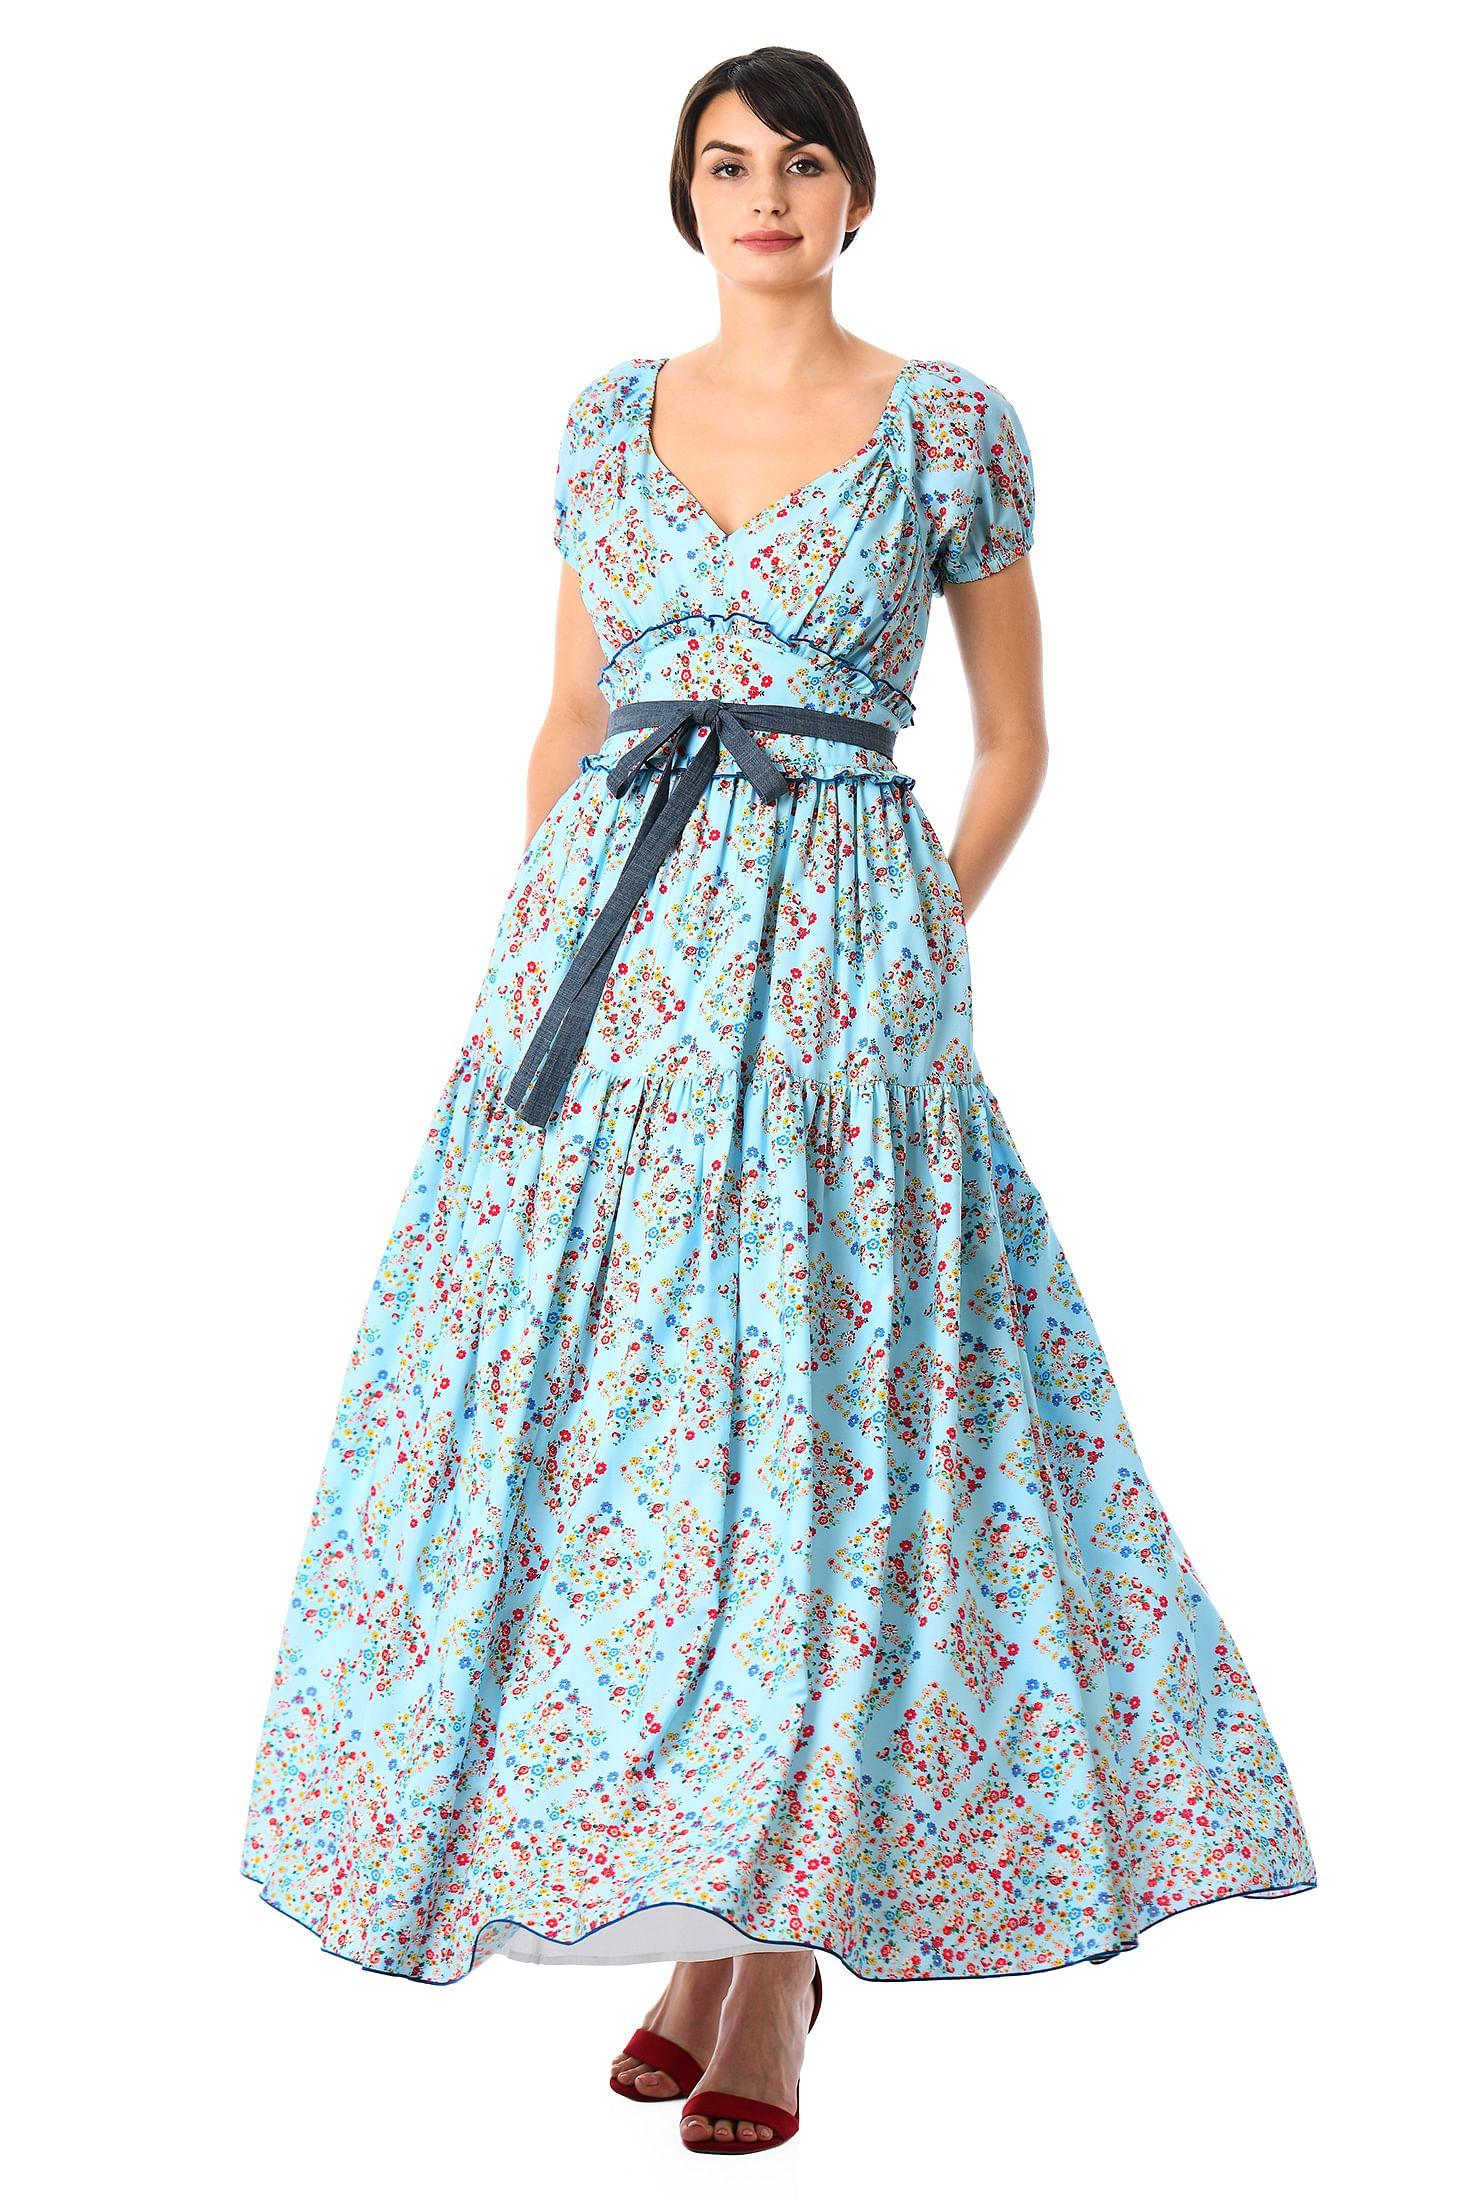 a0c738a5909 Women s Fashion Clothing 0-36W and Custom